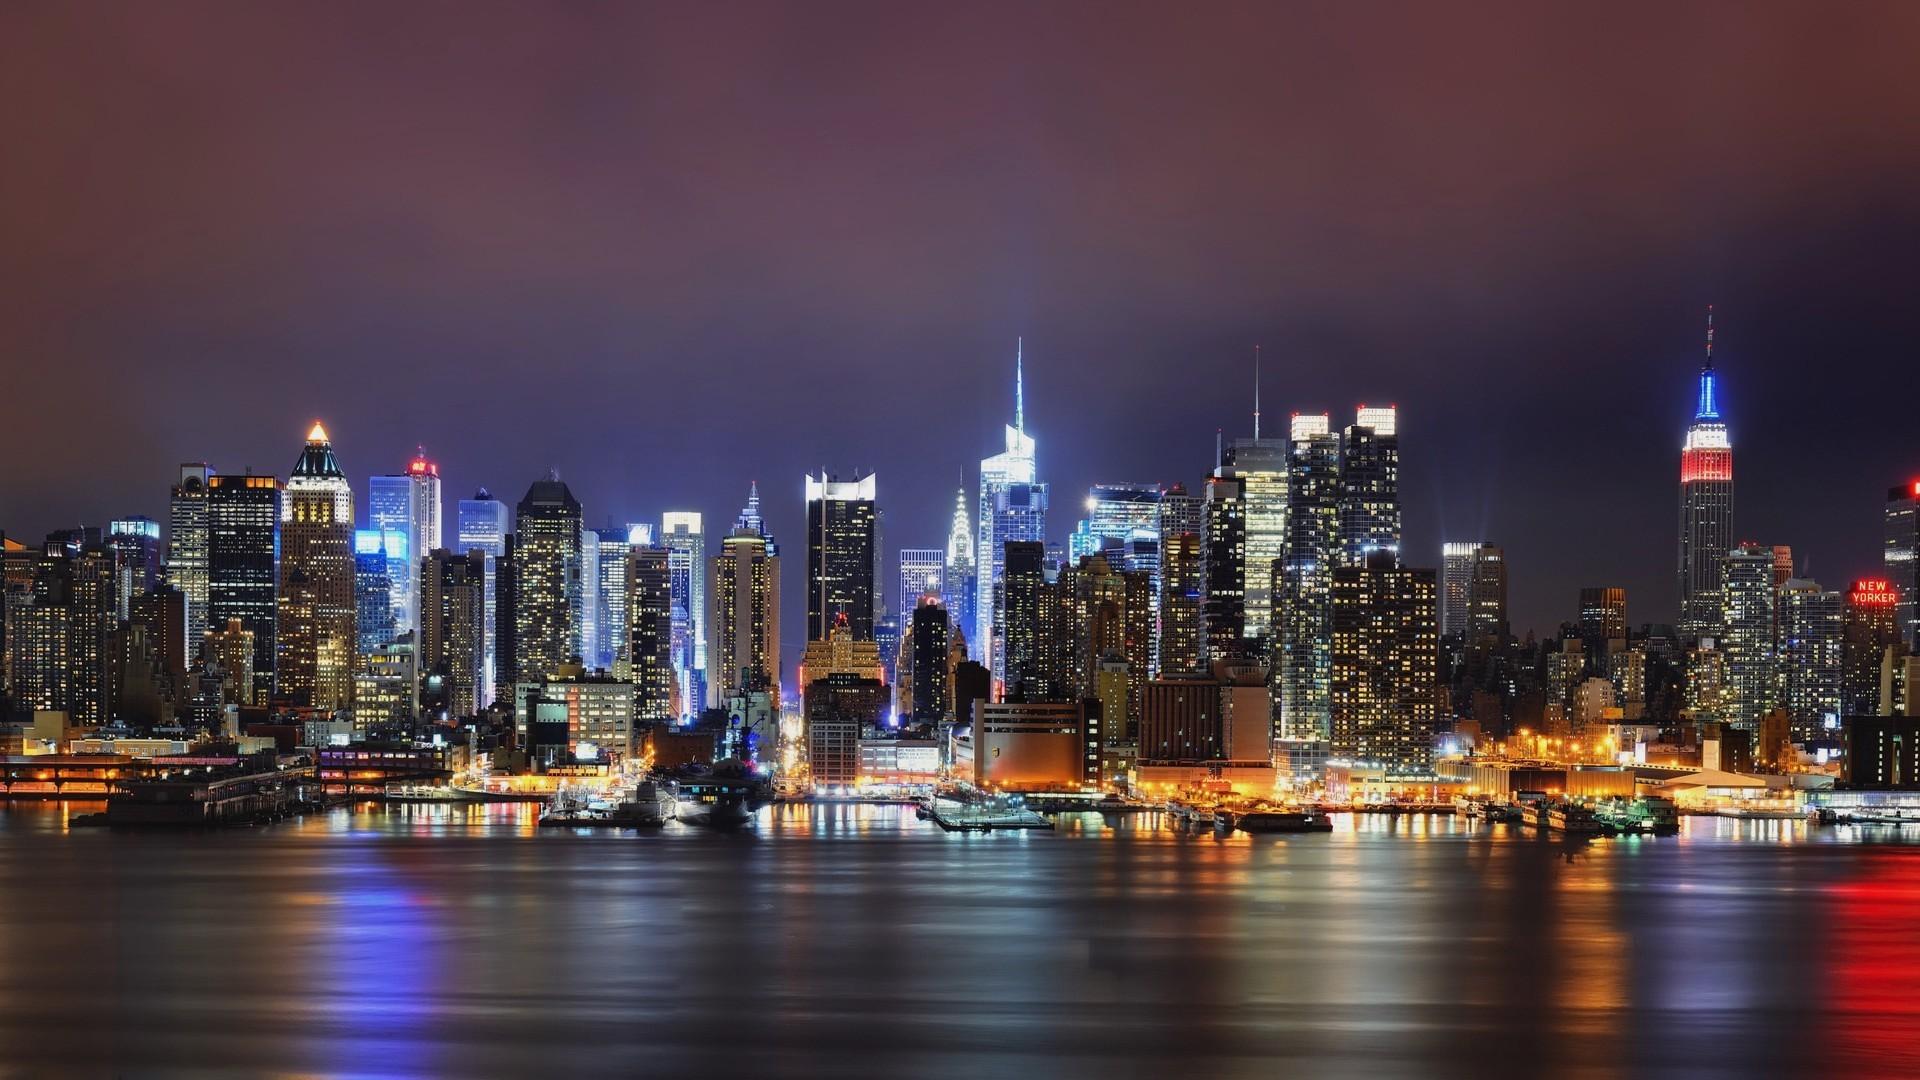 New york 1080p wallpaper 79 images - Wallpaper 1080p new york ...